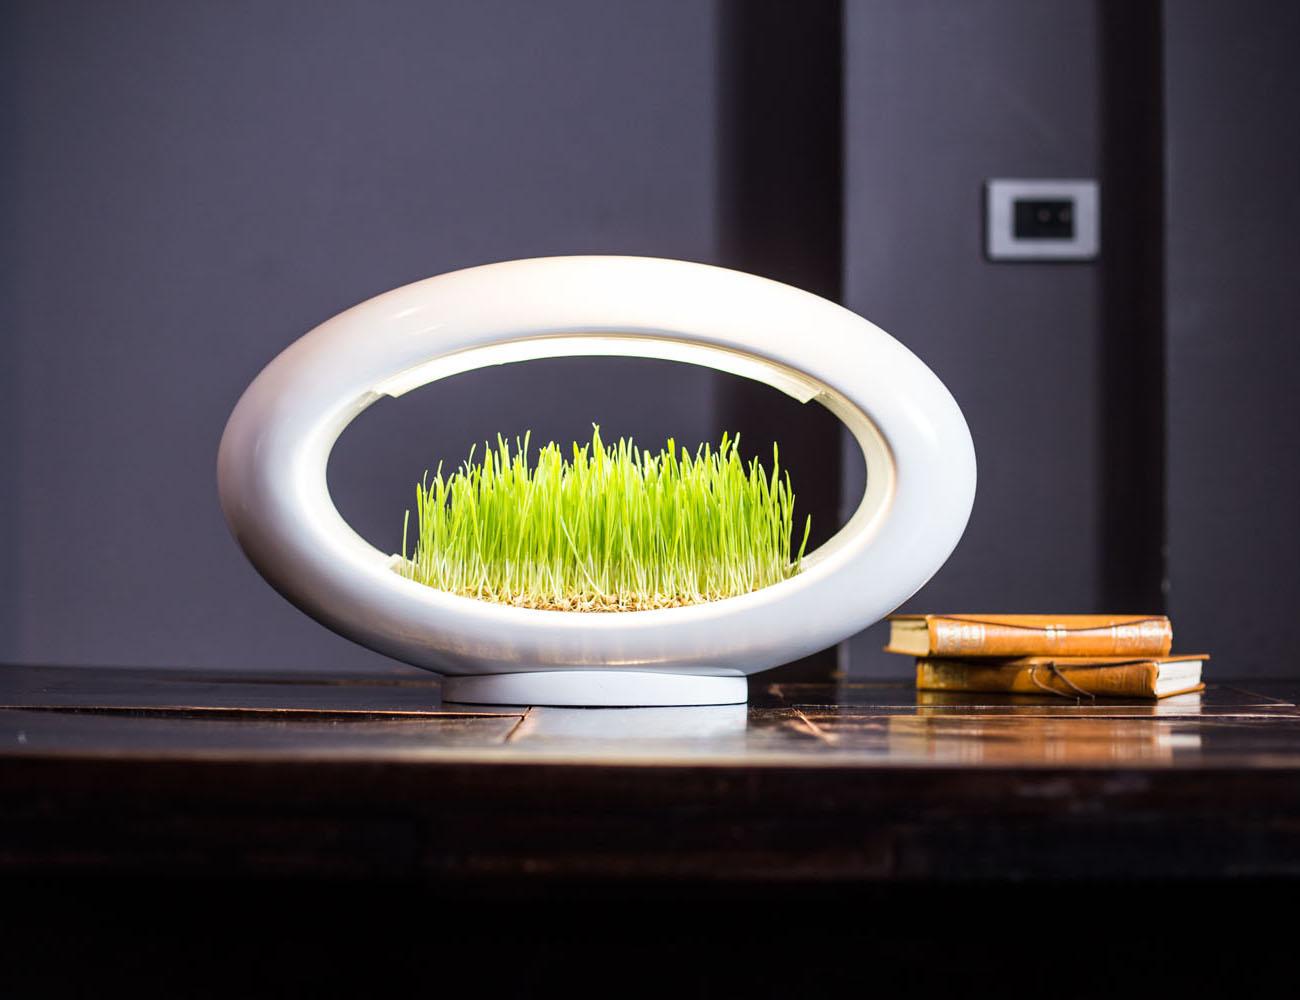 Grasslamp+%E2%80%93+The+Desktop+Garden+And+Light